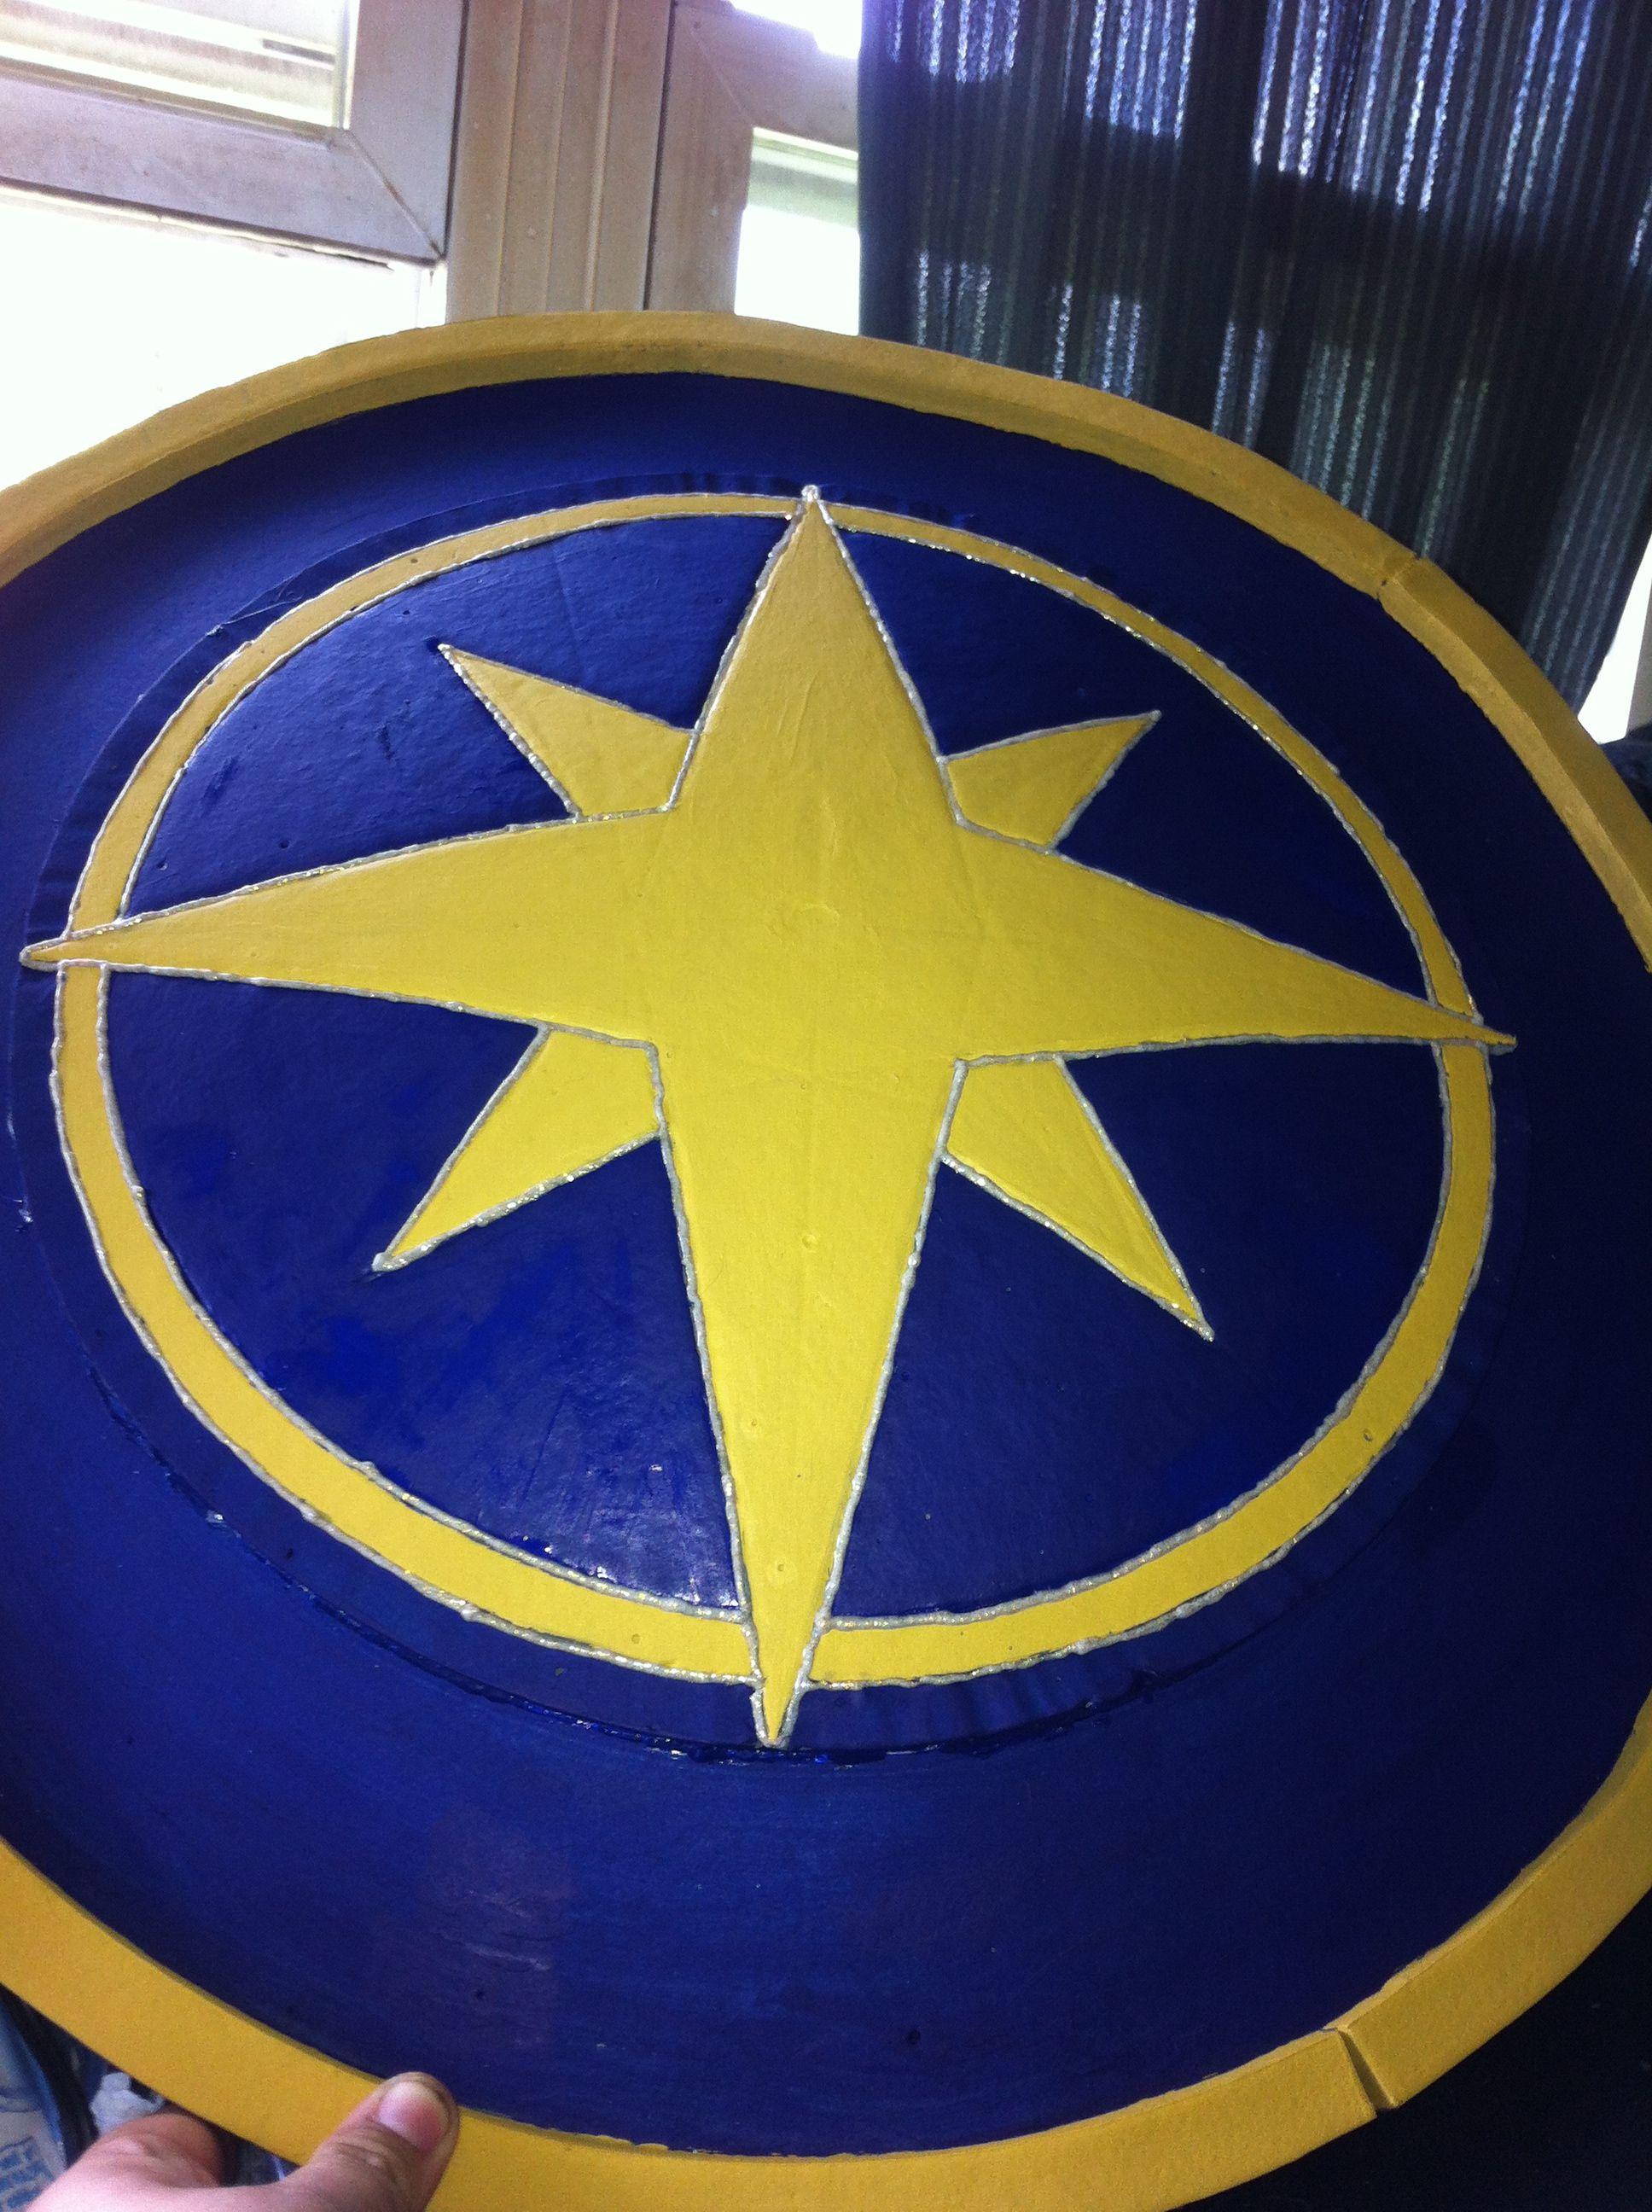 Shield for a friend